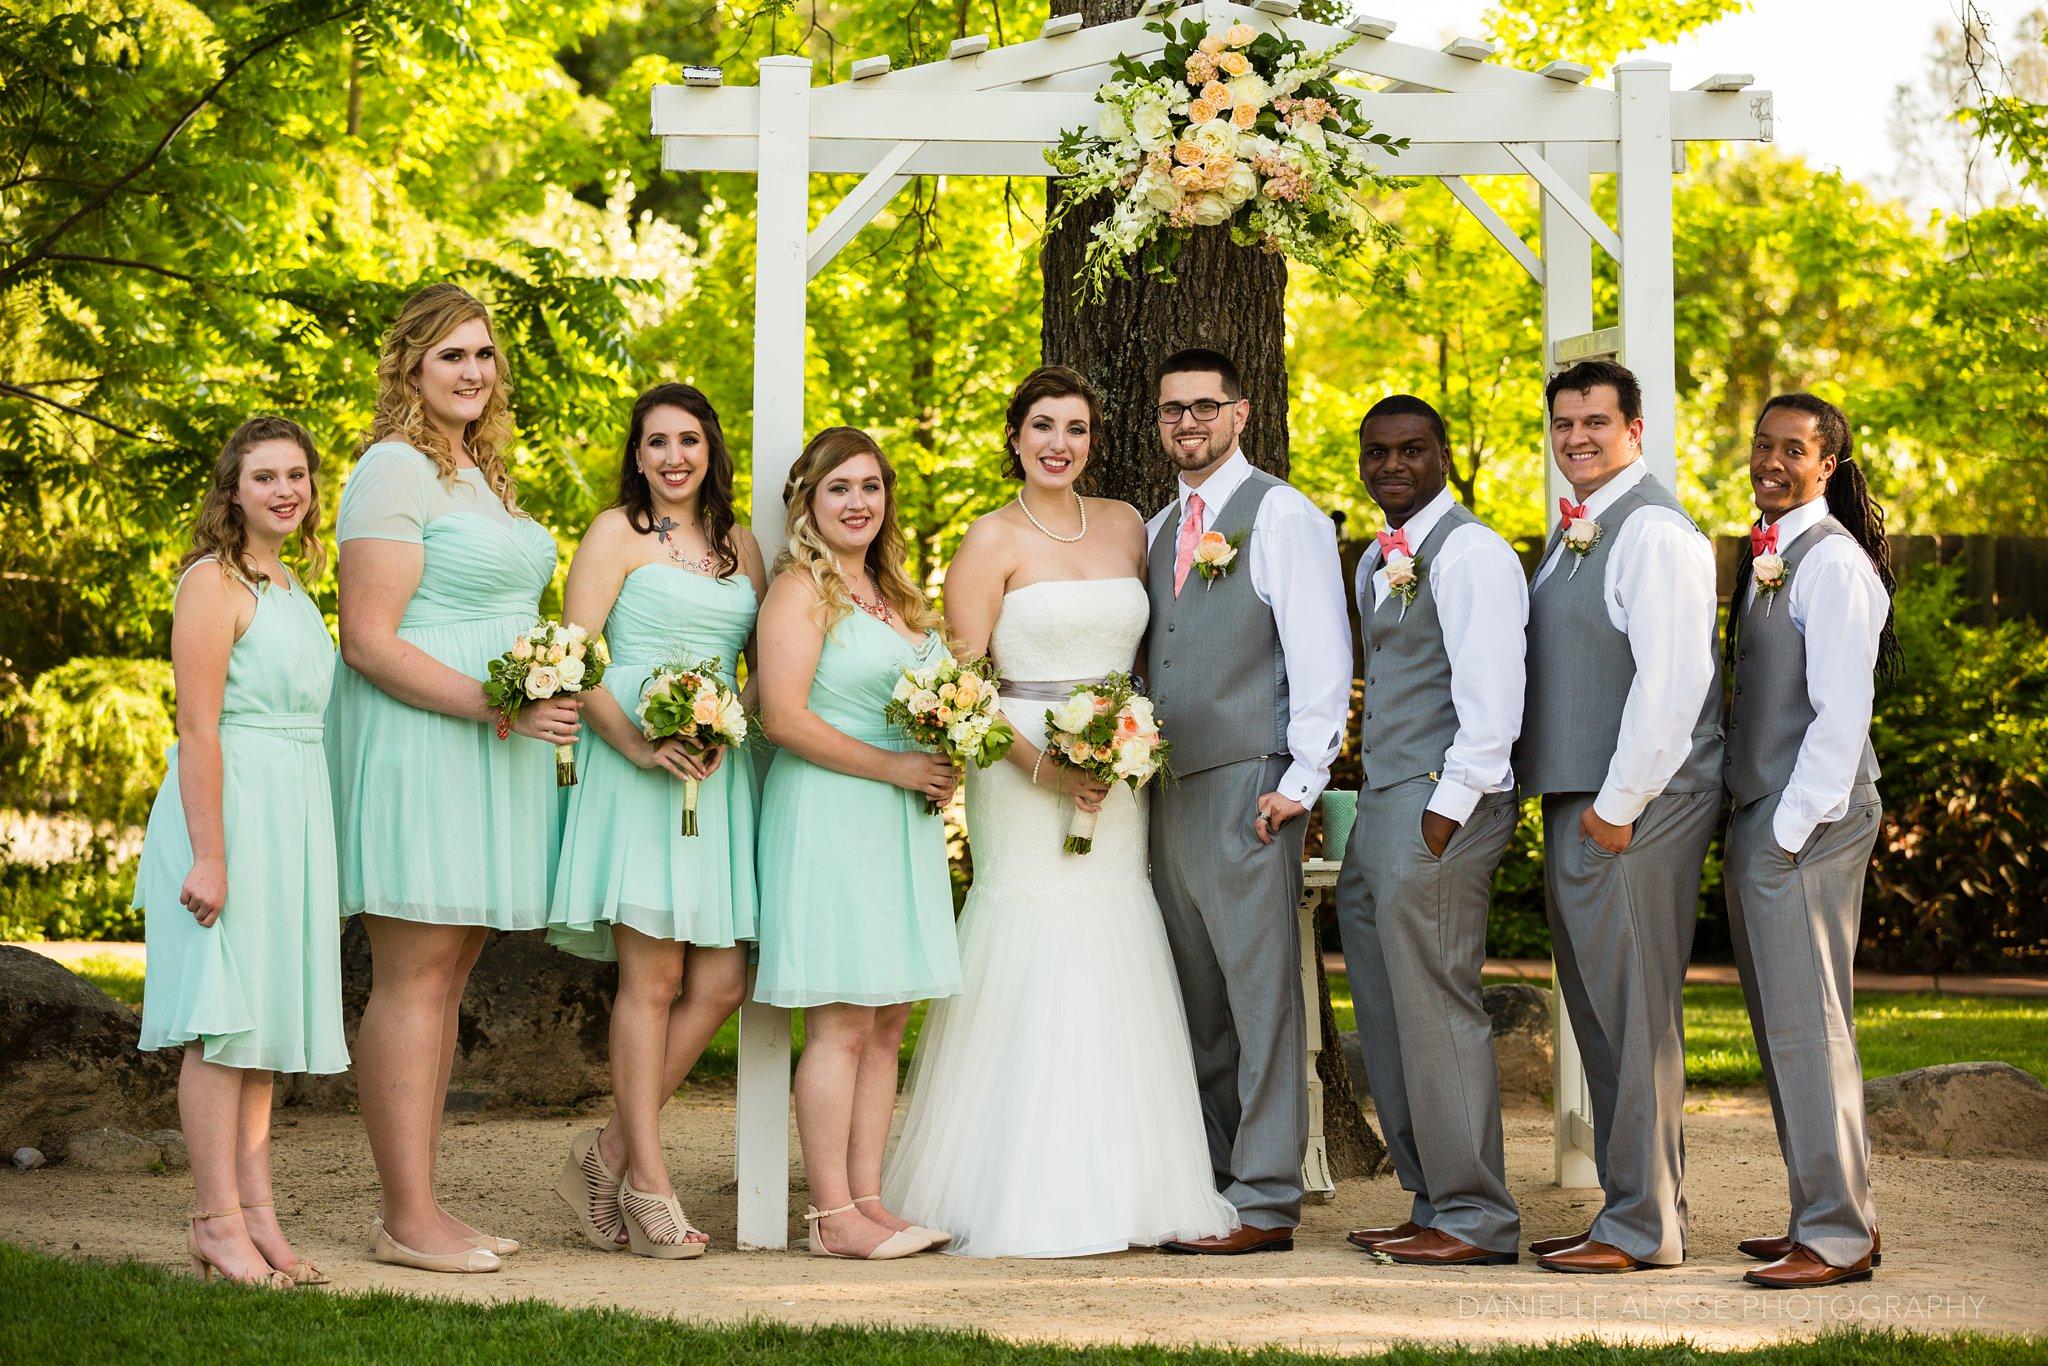 170507_blog_megan_david_wedding_loomis_flower_farm_inn_danielle_alysse_photography_sacramento_photographer0377_WEB.jpg